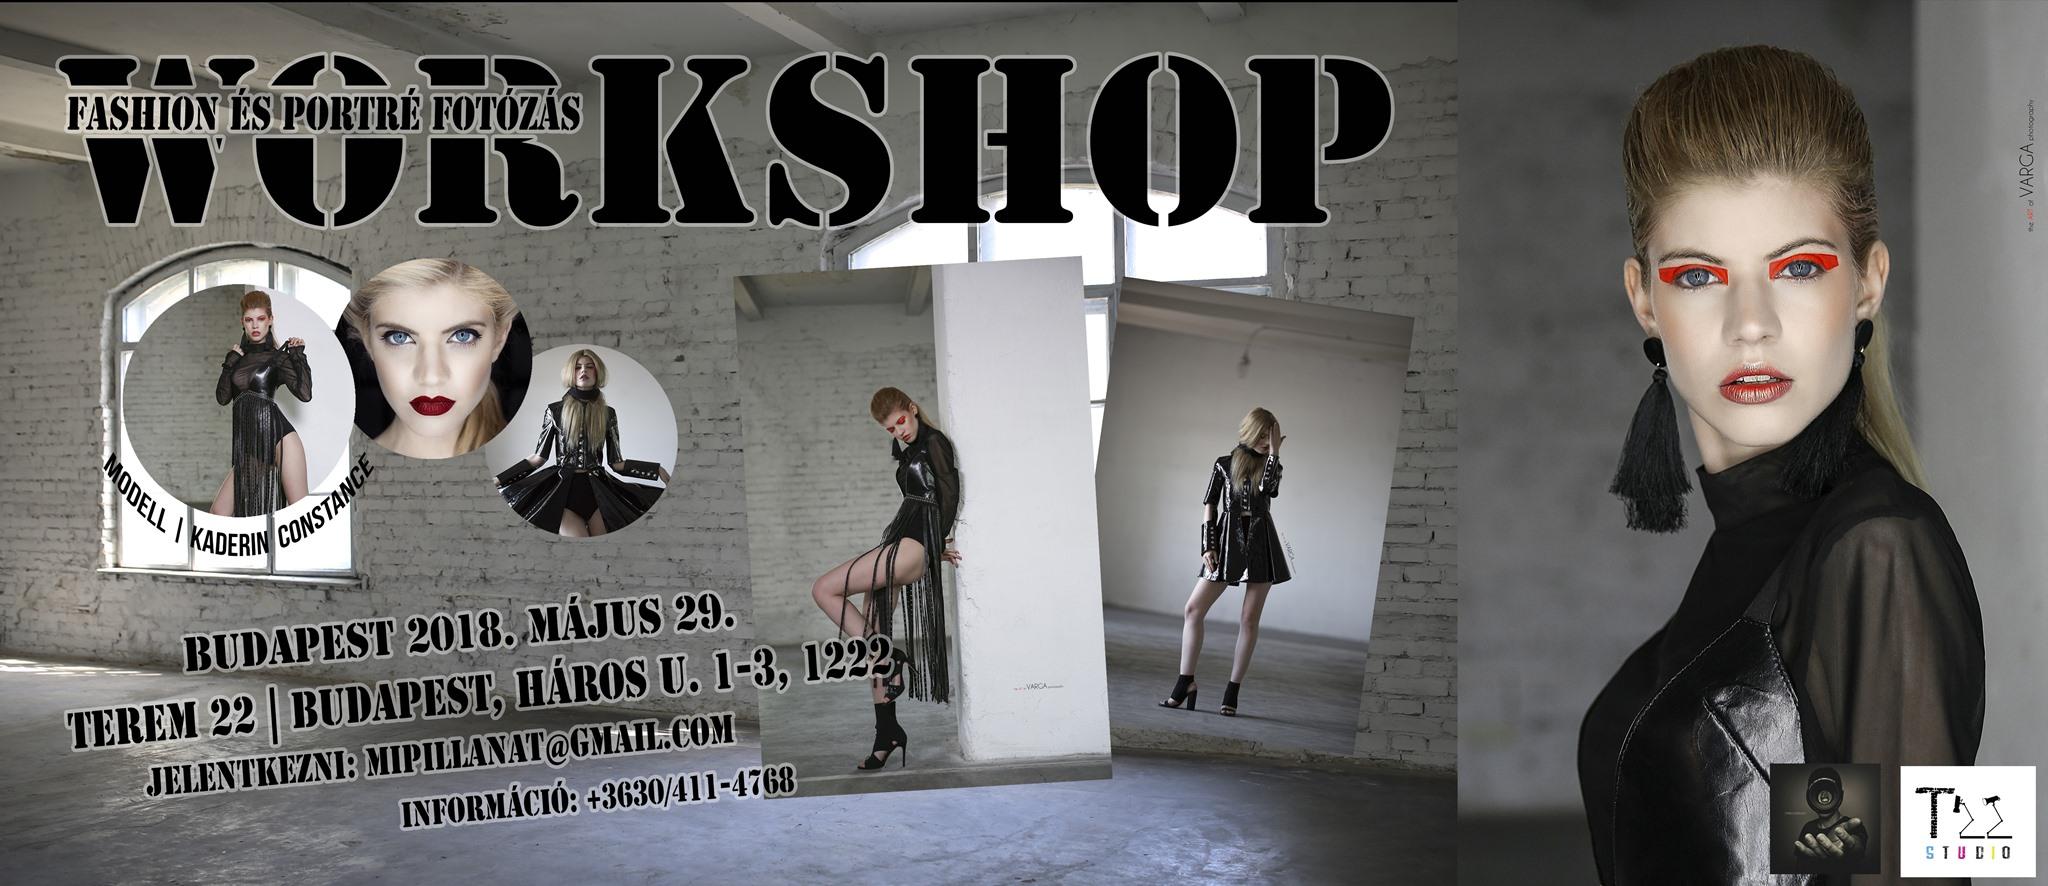 00VJZ_1578 fashion plakát